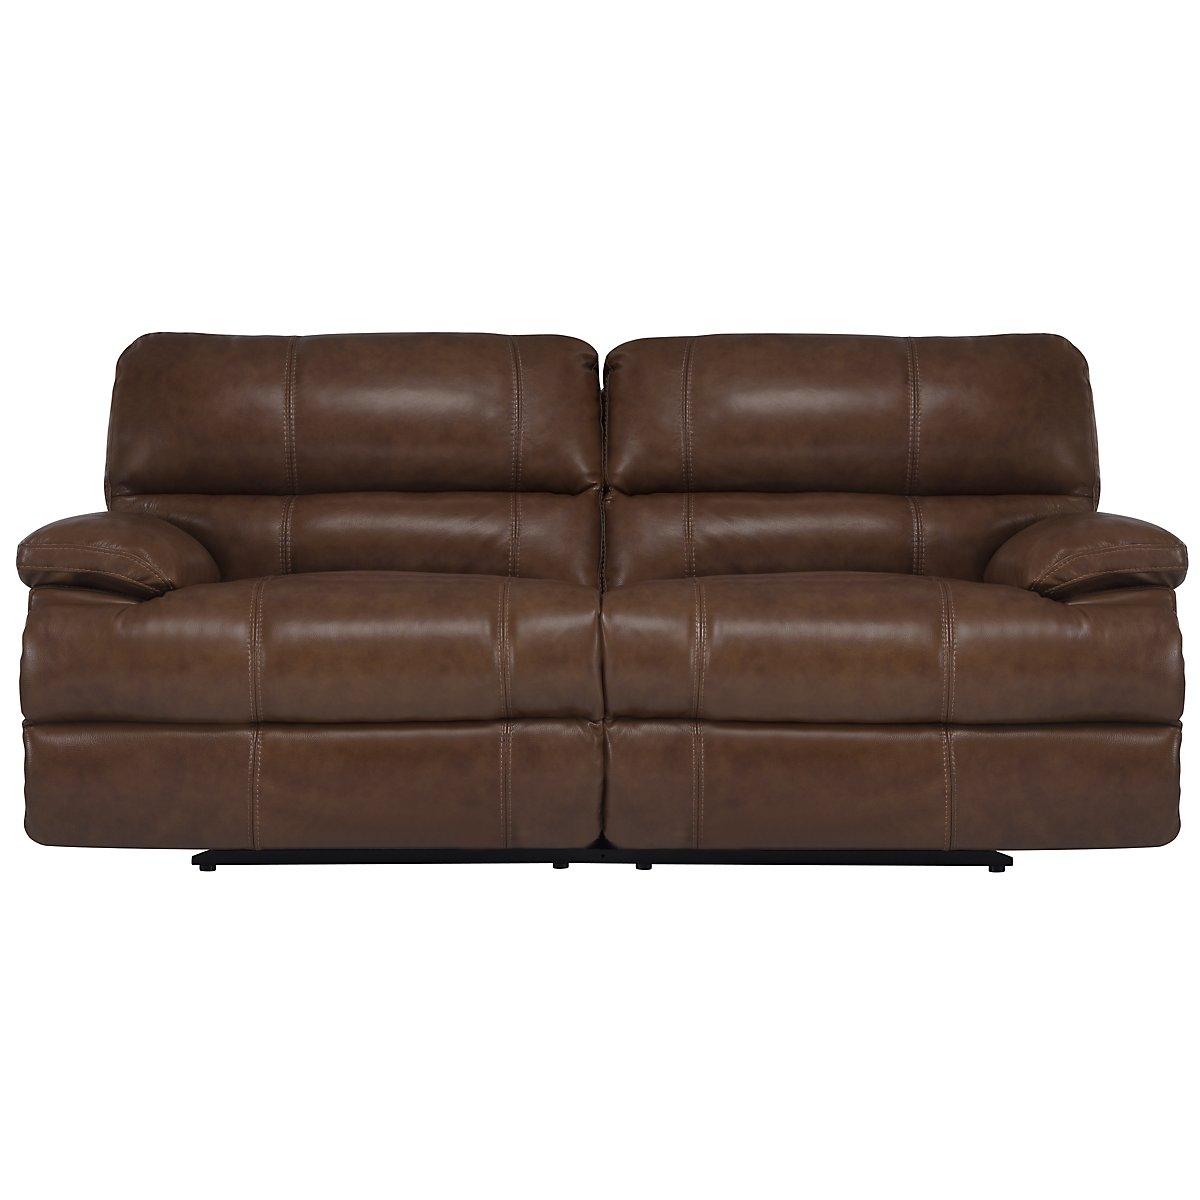 Alton2 Medium Brown Leather & Vinyl Reclining Sofa